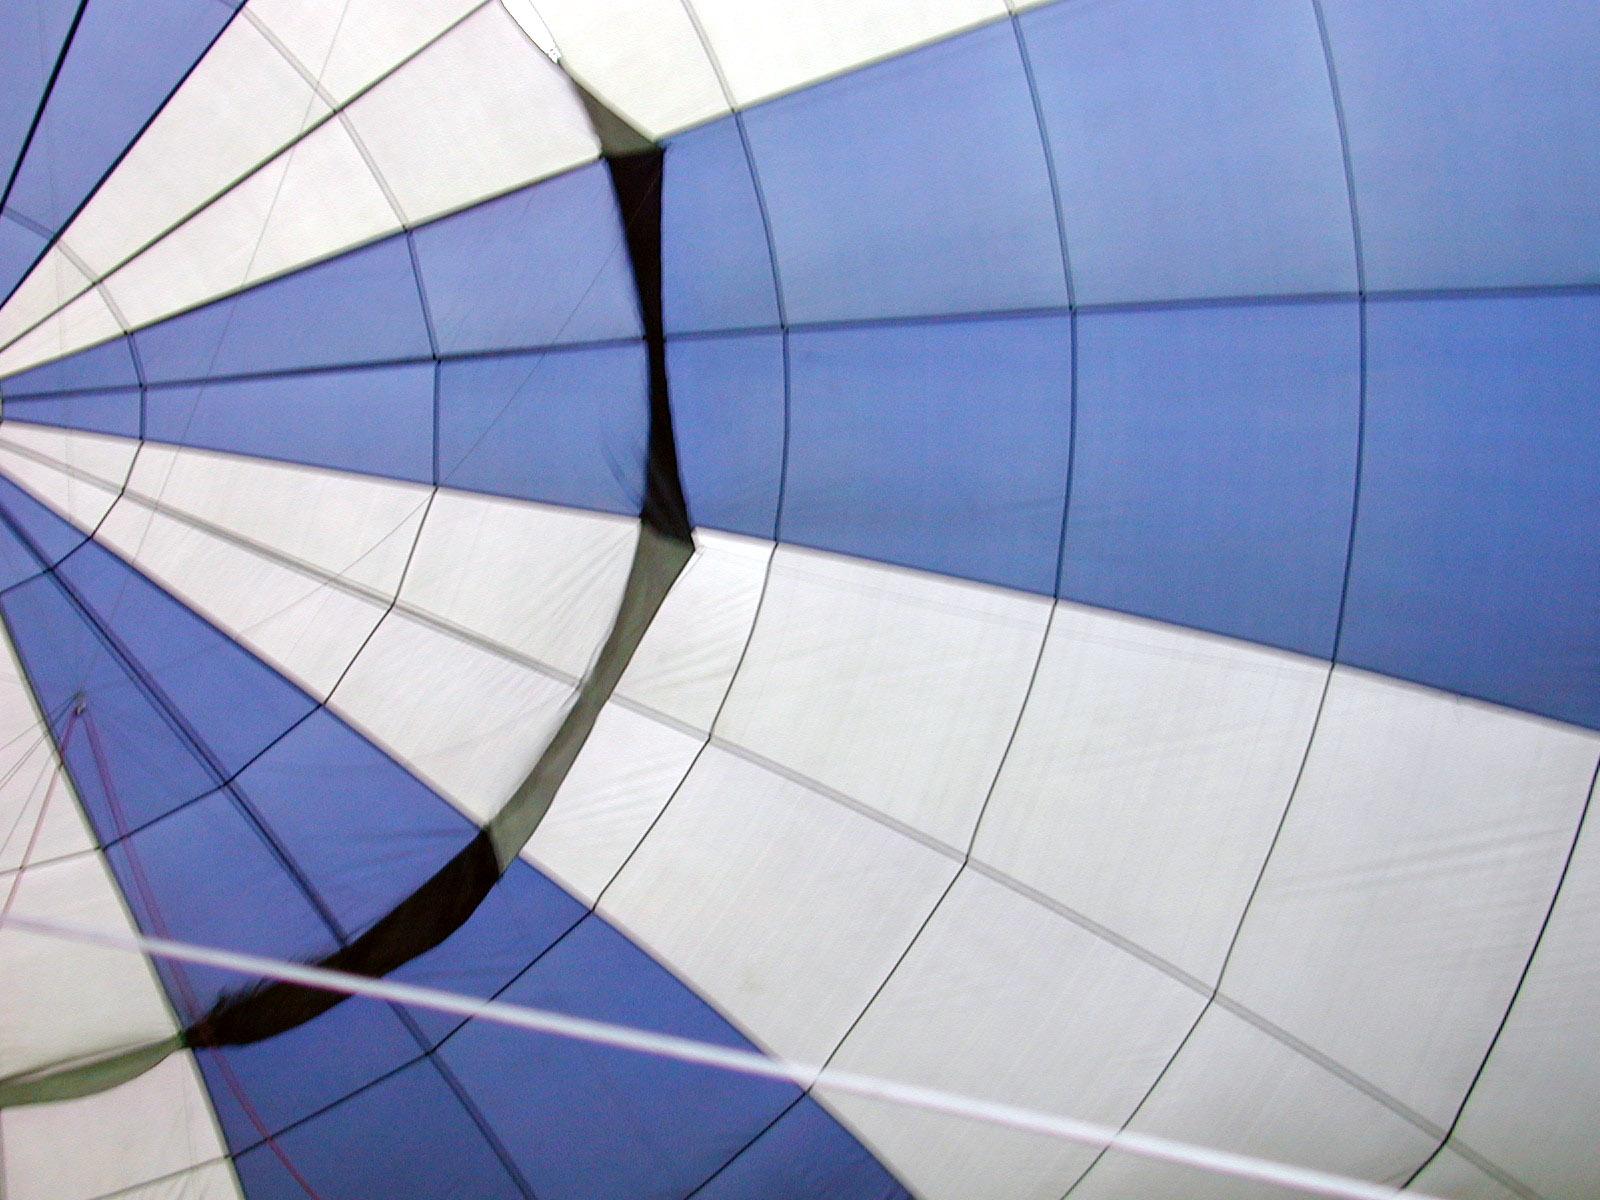 texture vehicles air hotairballoon balloon ballooning cloth textures silk polyester string strings web blue white trapezium inside